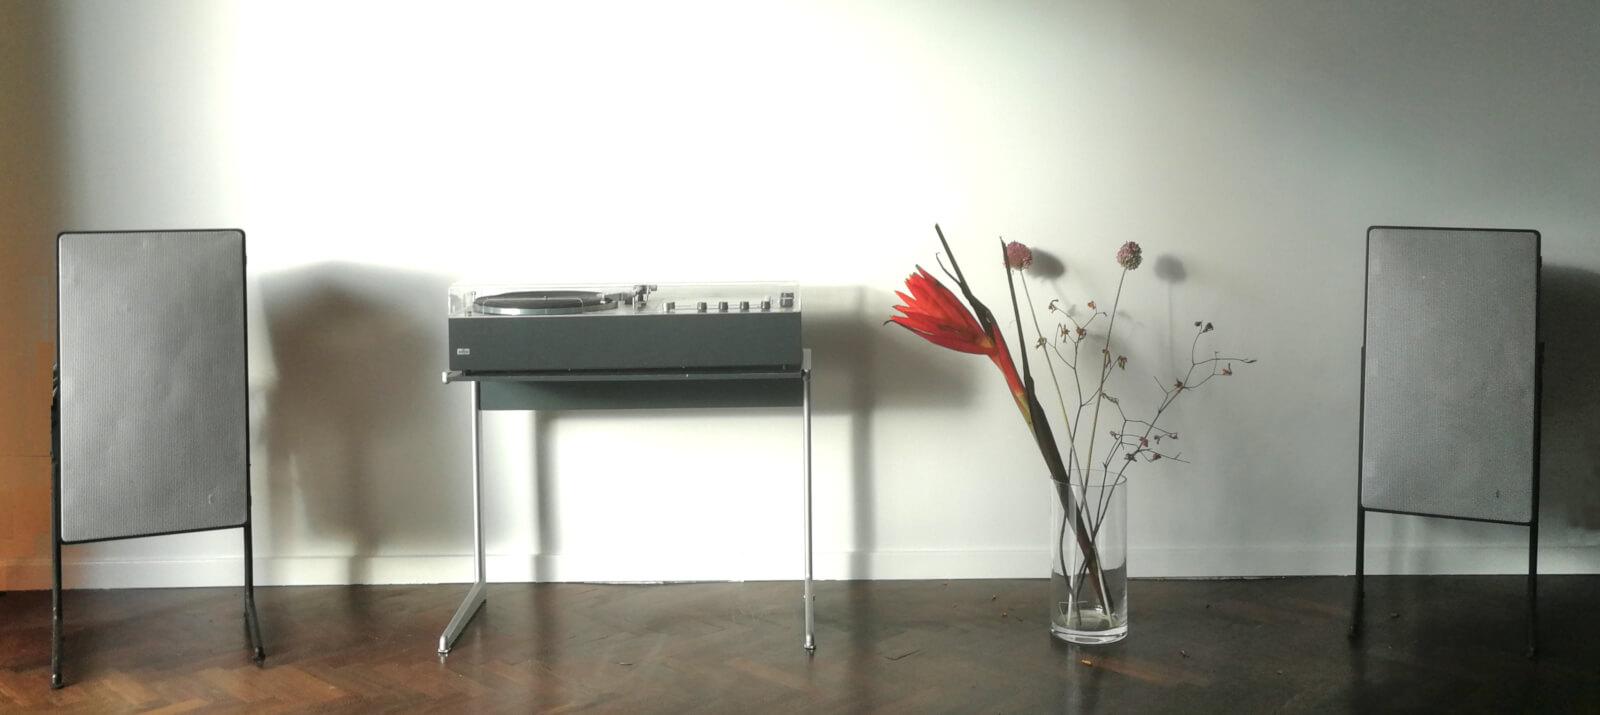 braun audio 310 & L710 black with speaker stands LF700